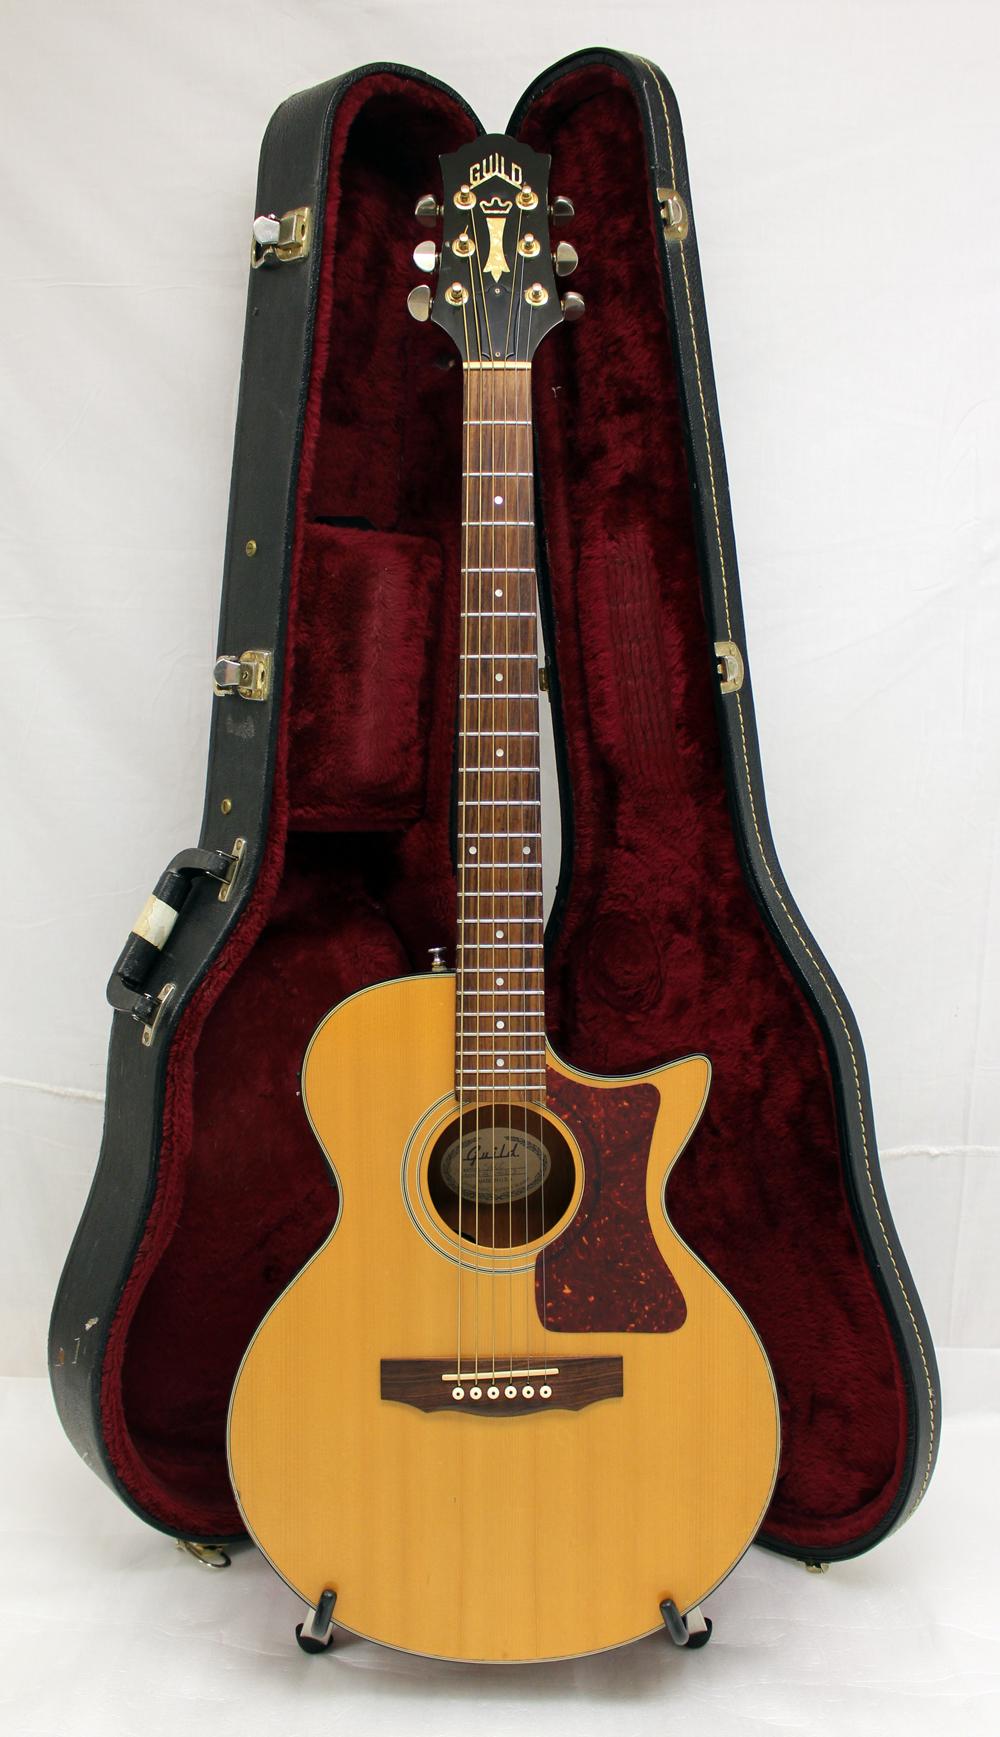 used guild s4ce songbird acoustic electric guitar w guild case gc. Black Bedroom Furniture Sets. Home Design Ideas